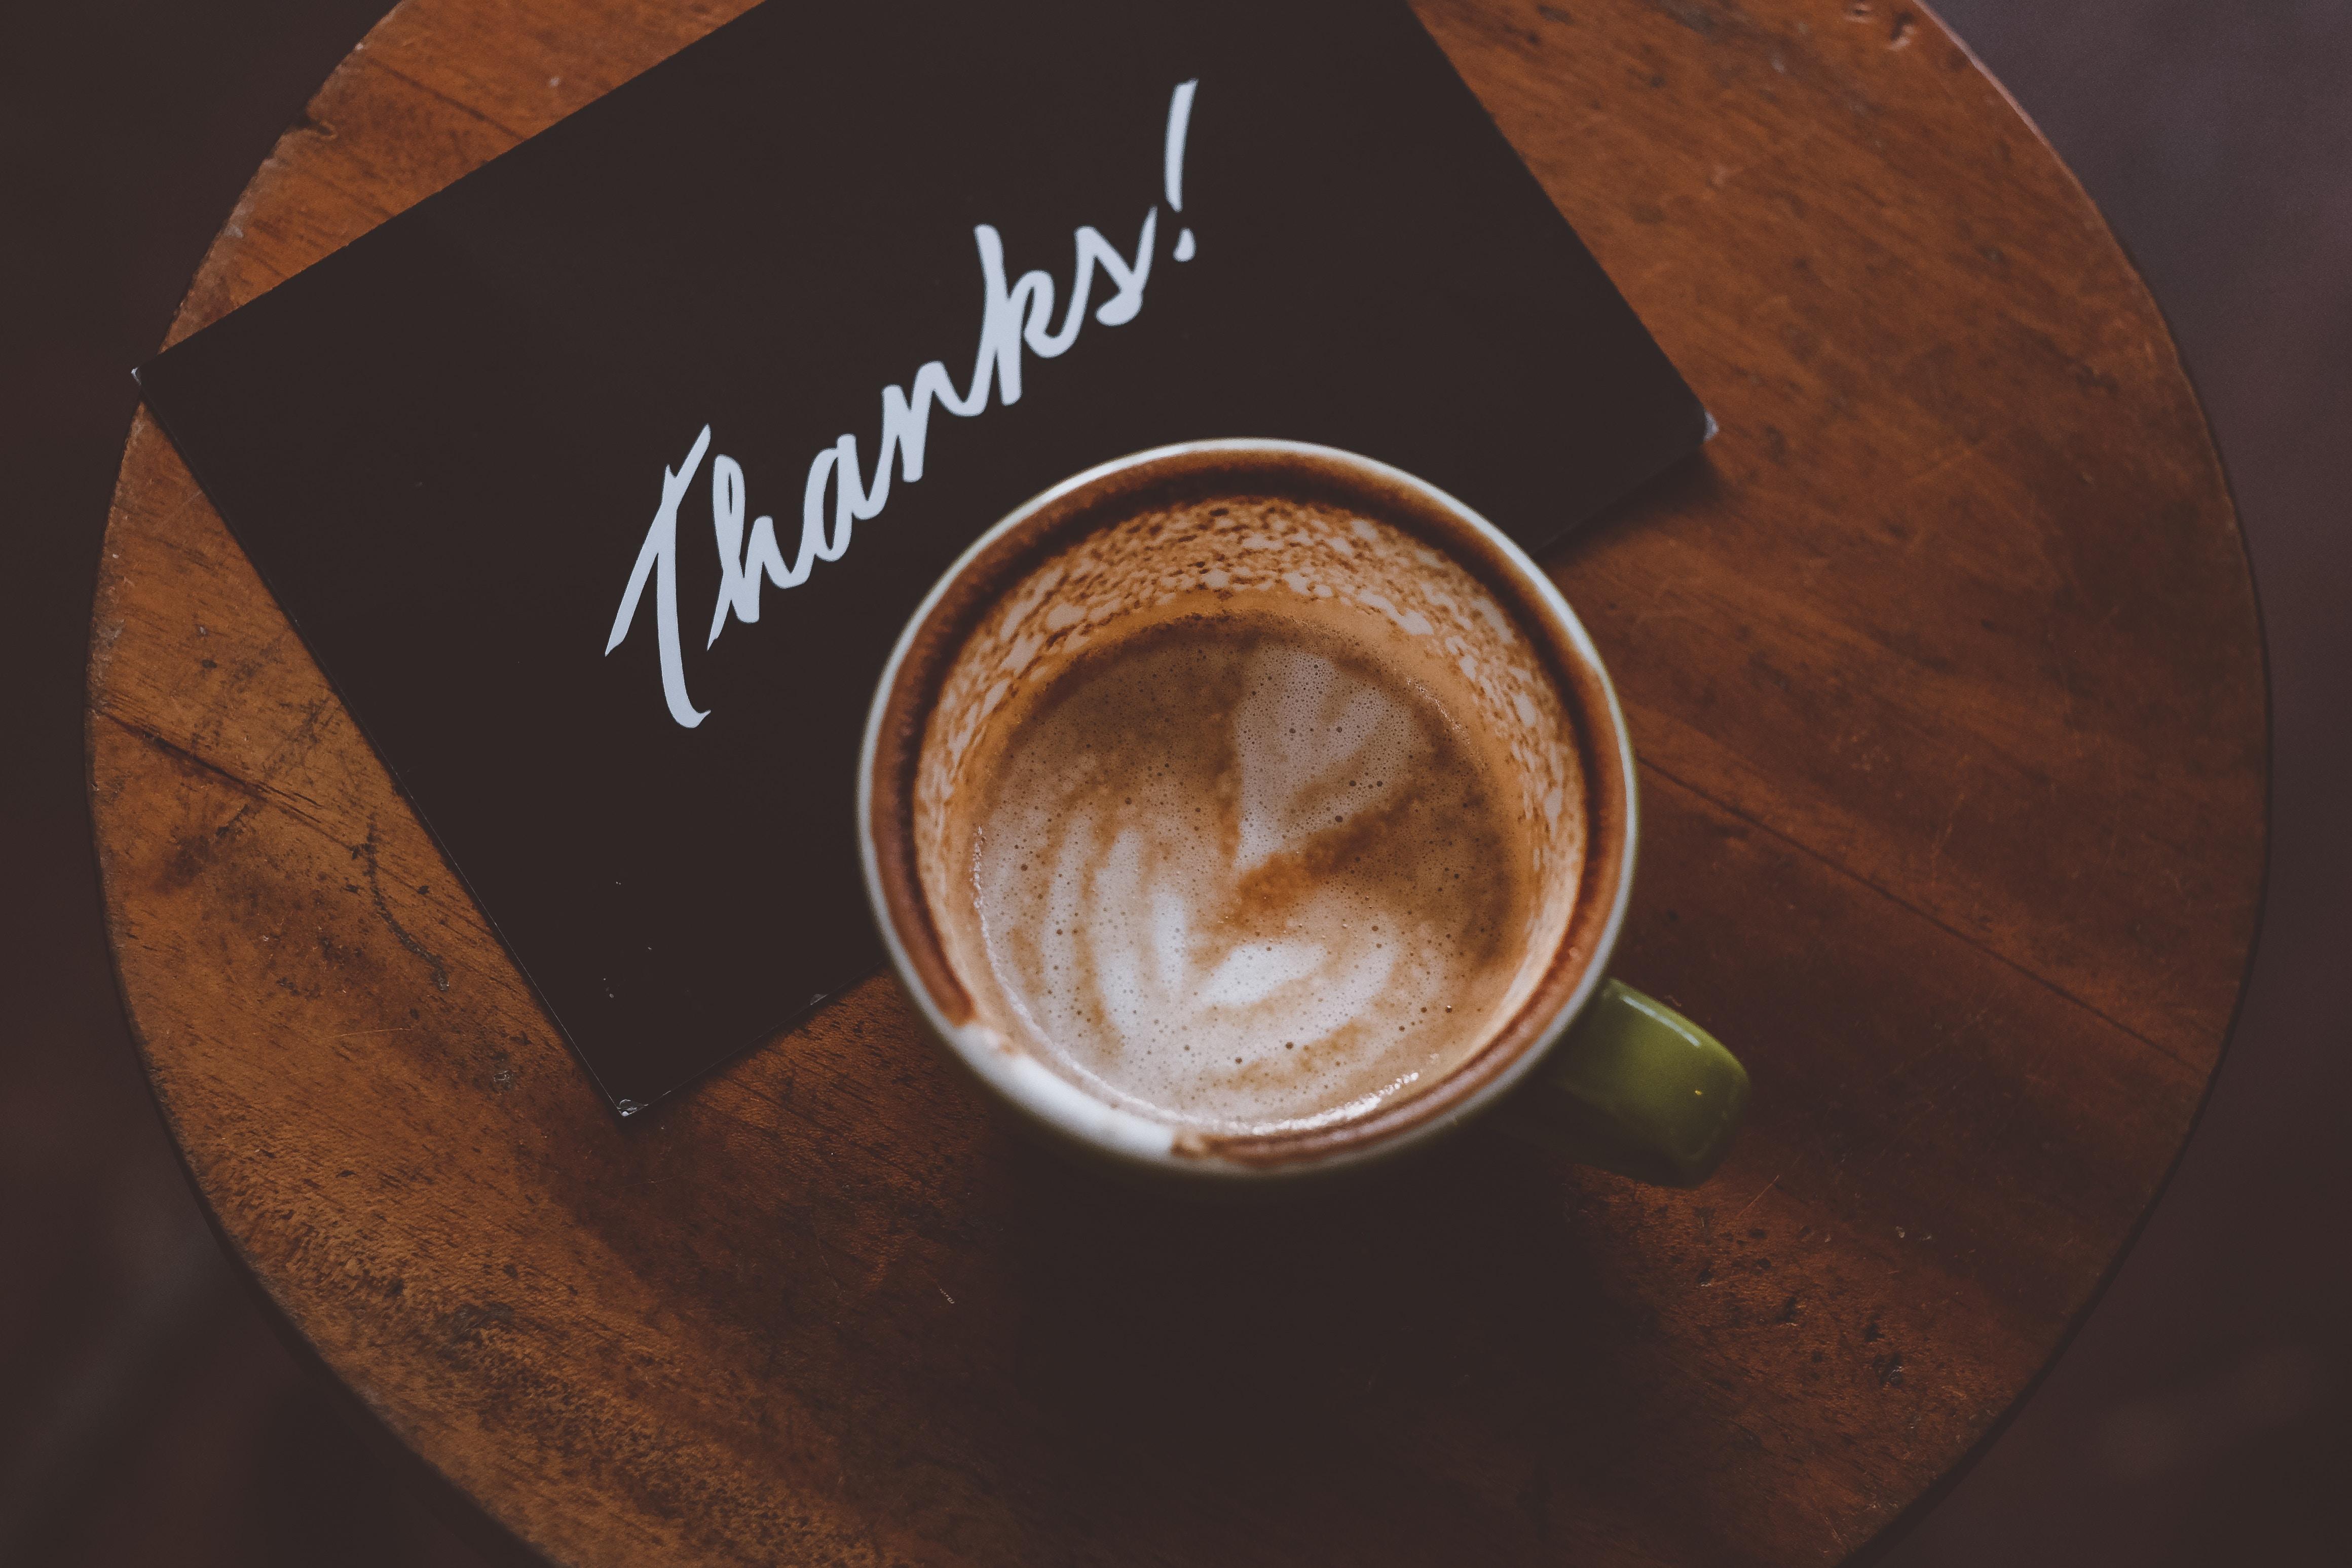 Wallpaper Coffee Cup Card Text Gratitude 4641x3094 Goodfon 1184682 Hd Wallpapers Wallhere